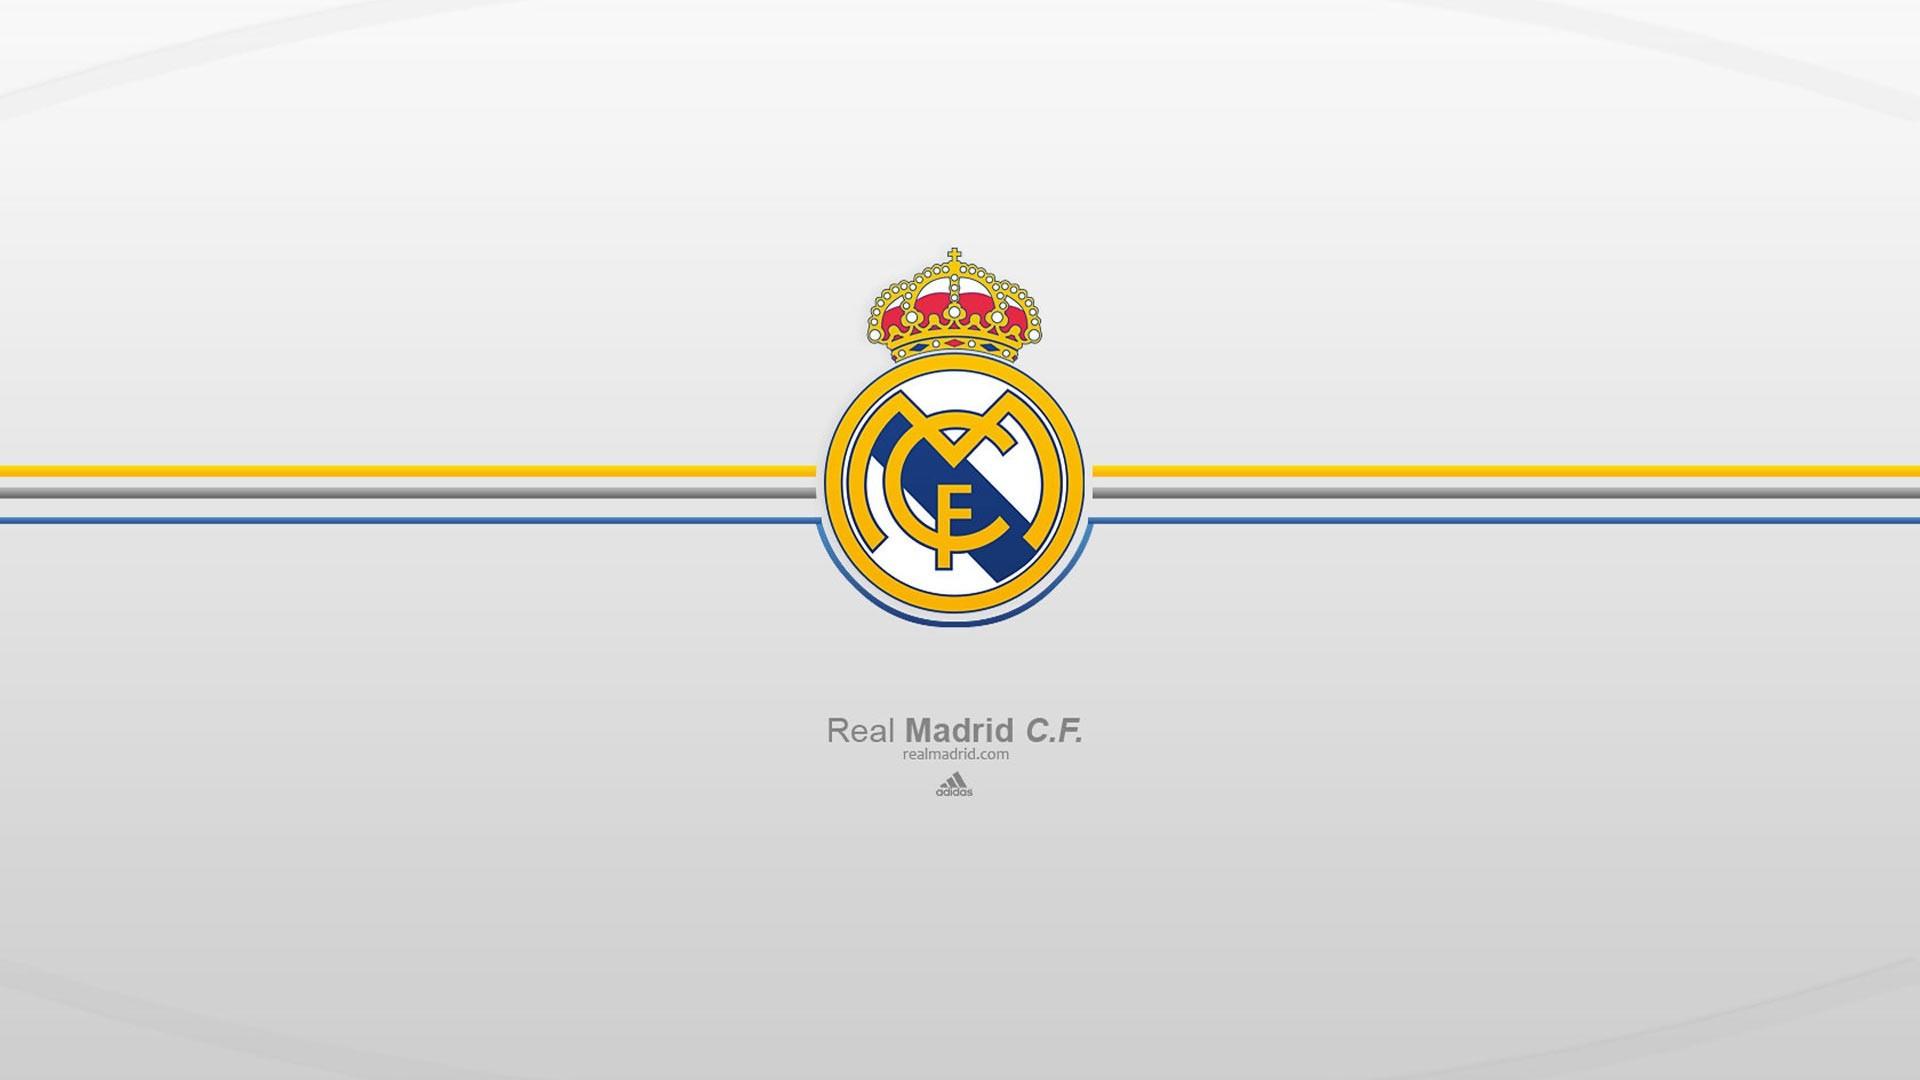 Fcb Real